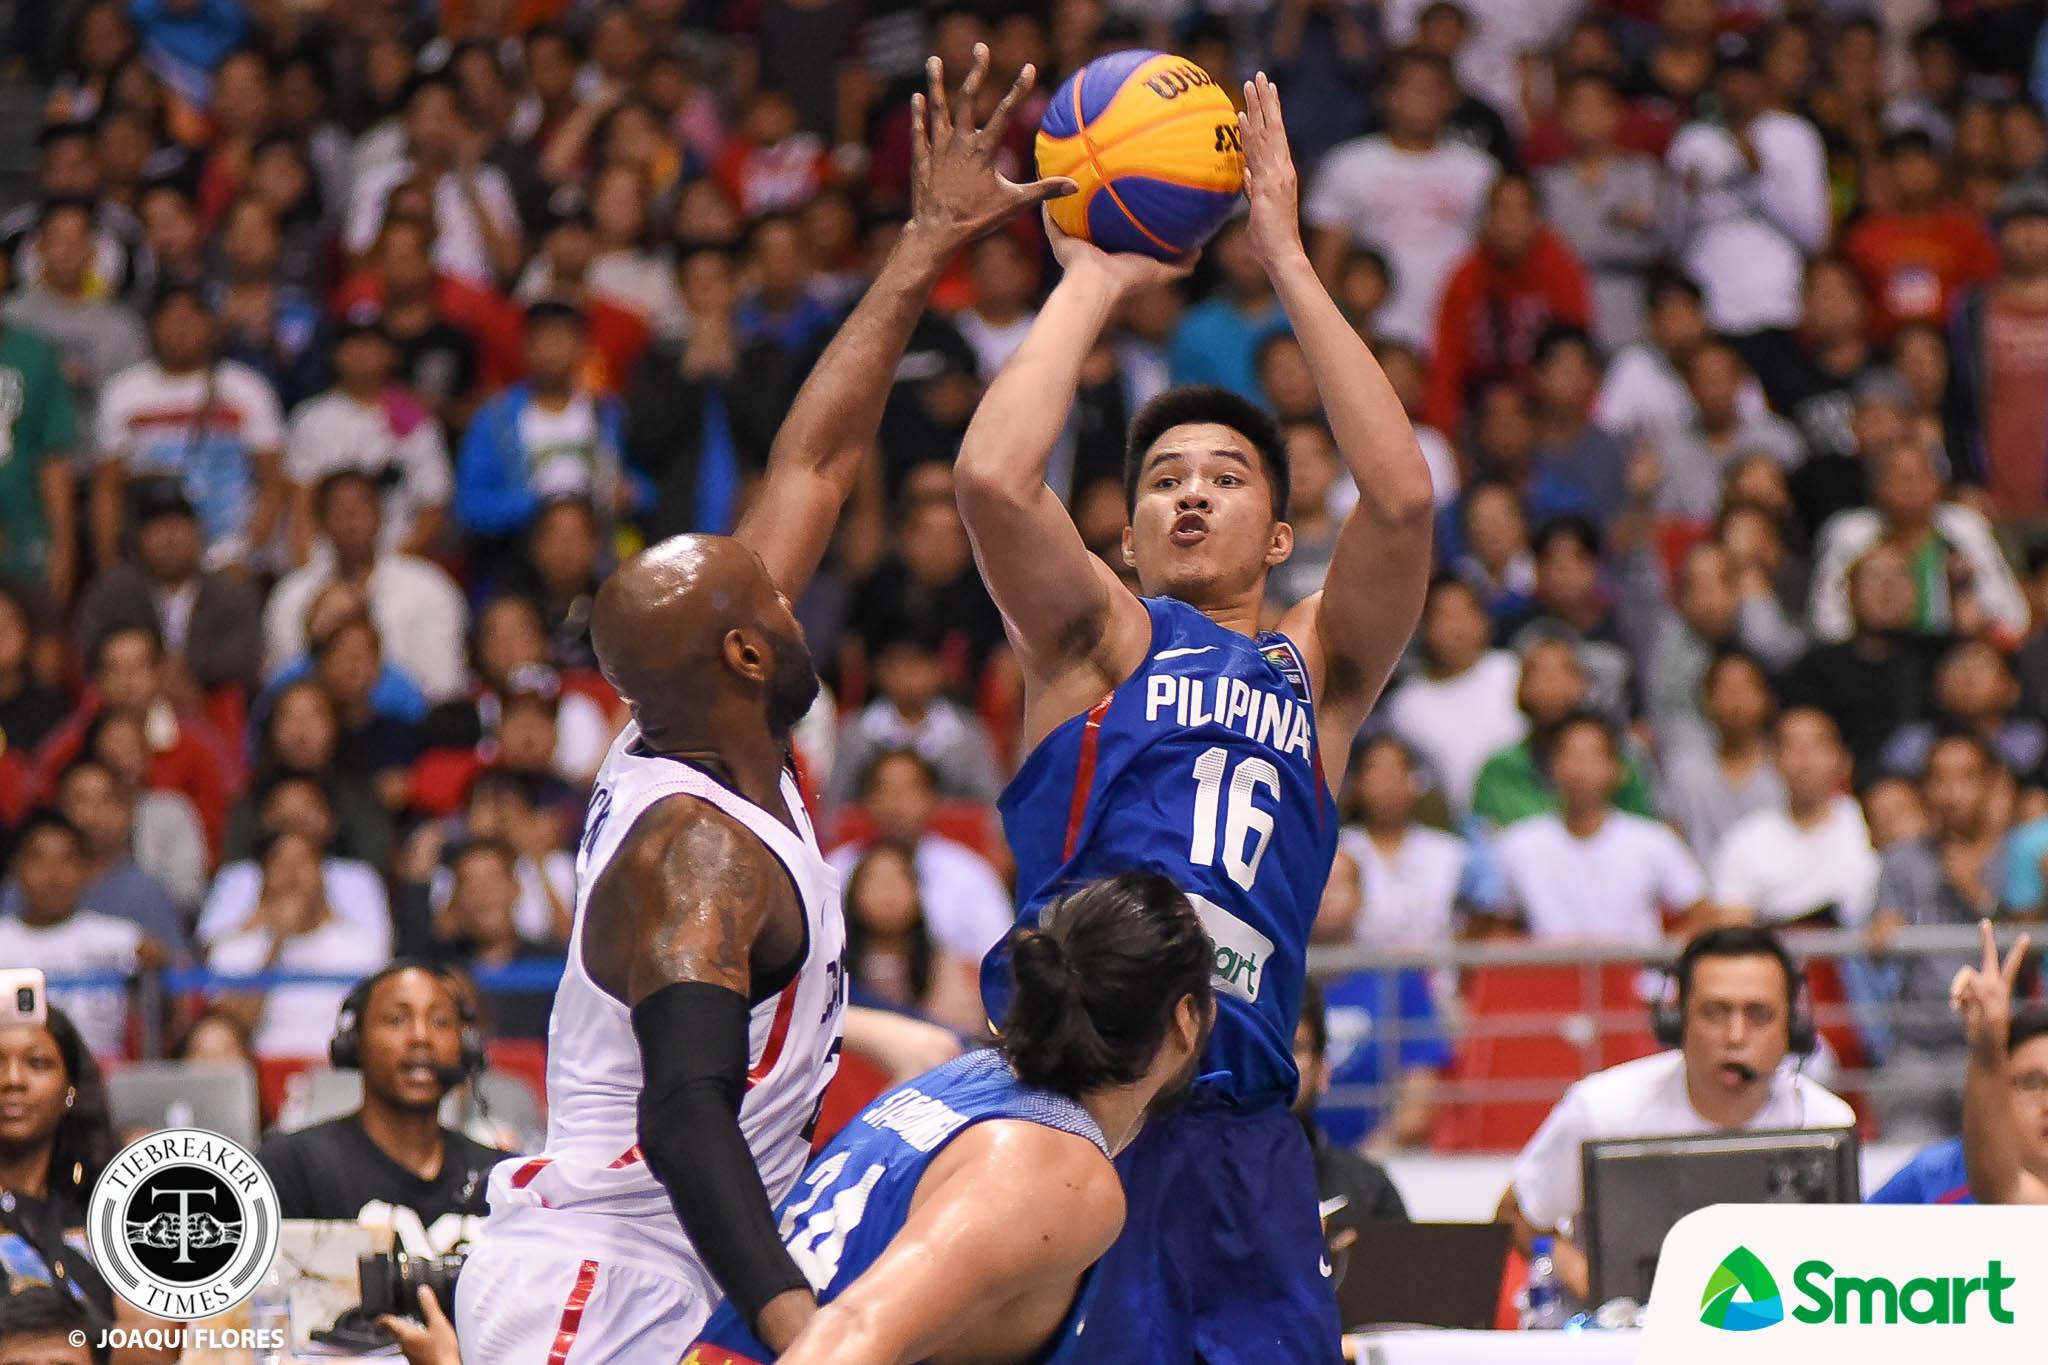 FIBA 3×3 World Cup Philippines vs. Canada – Pogoy-0716